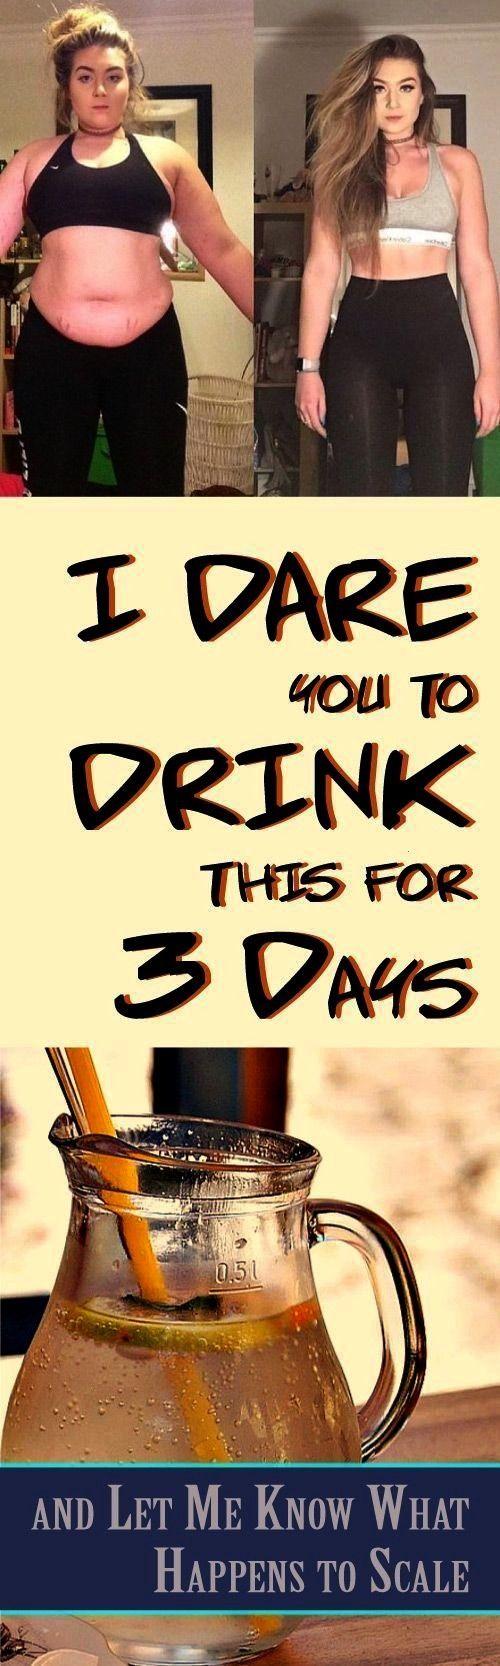 #lifehacks #skalieren #passiert #fitness #trinken #happens #wissen #scale #drink #für #what #lass #k...